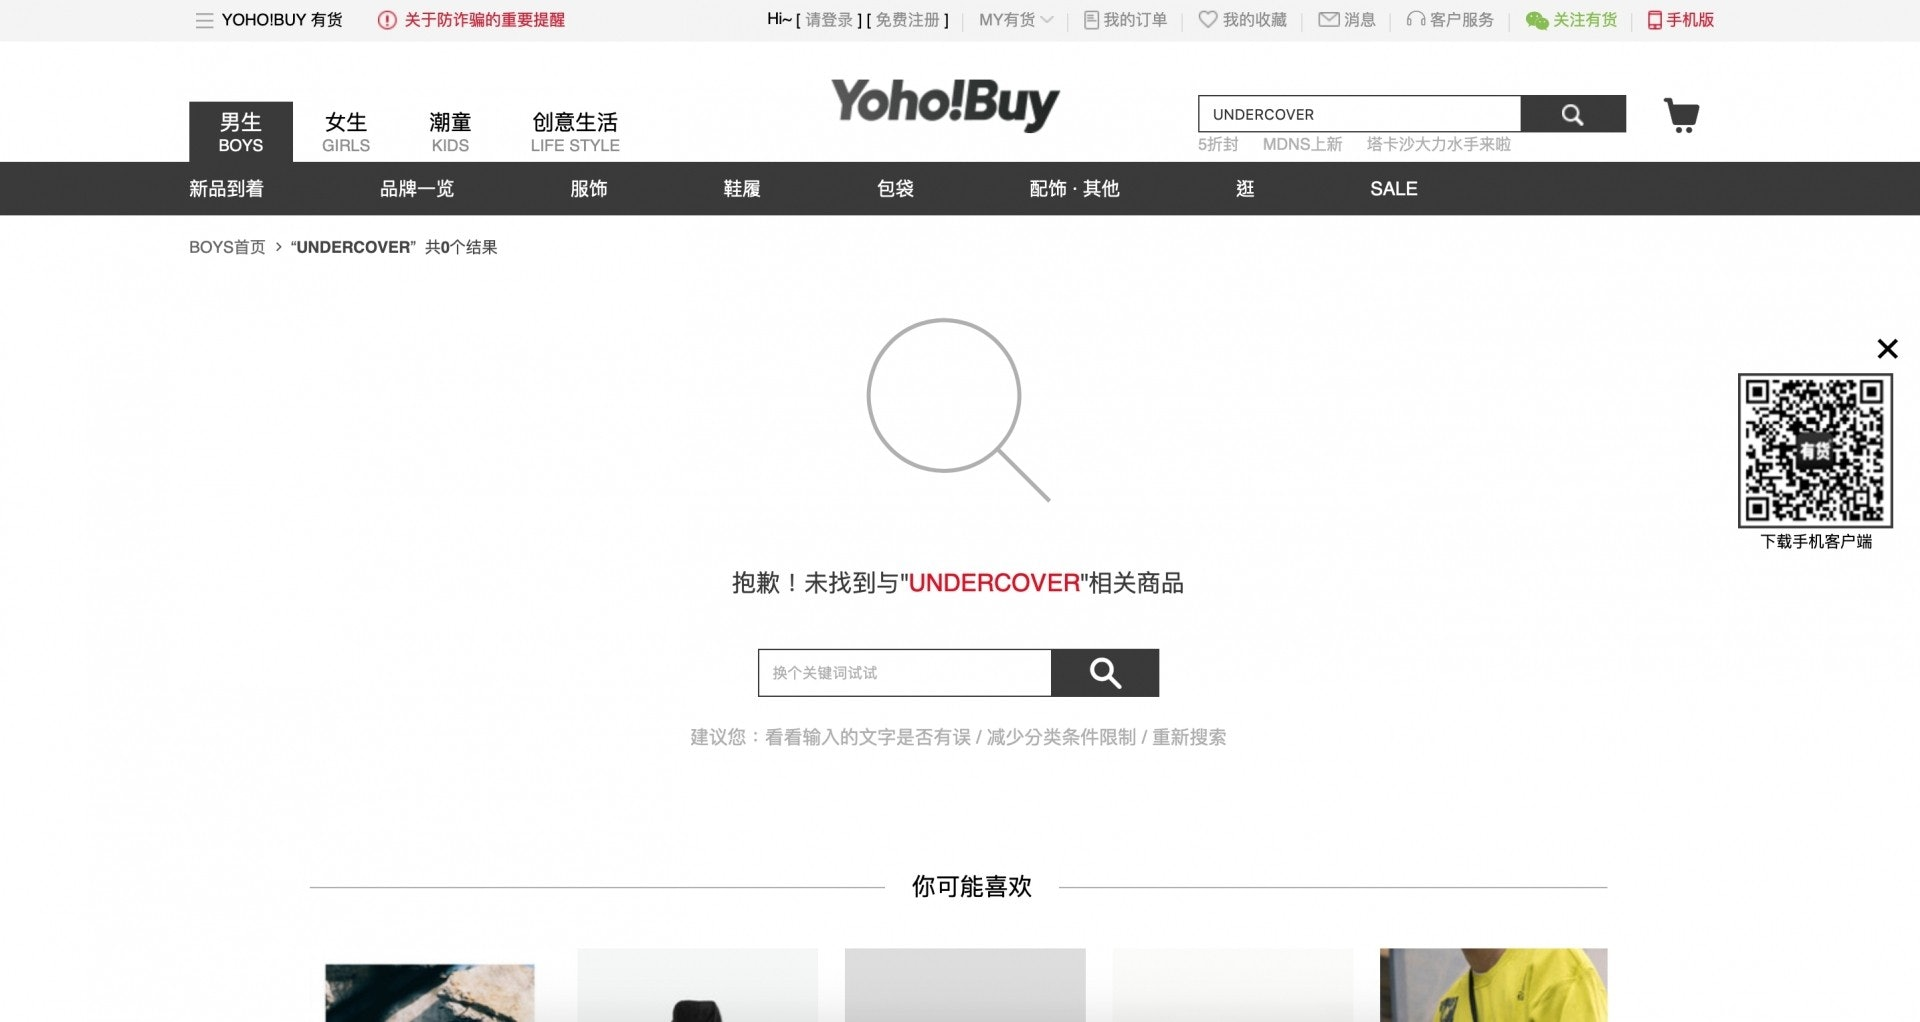 「Yoho!Buy有貨」已將UNDERCOVER下架(網上圖片)